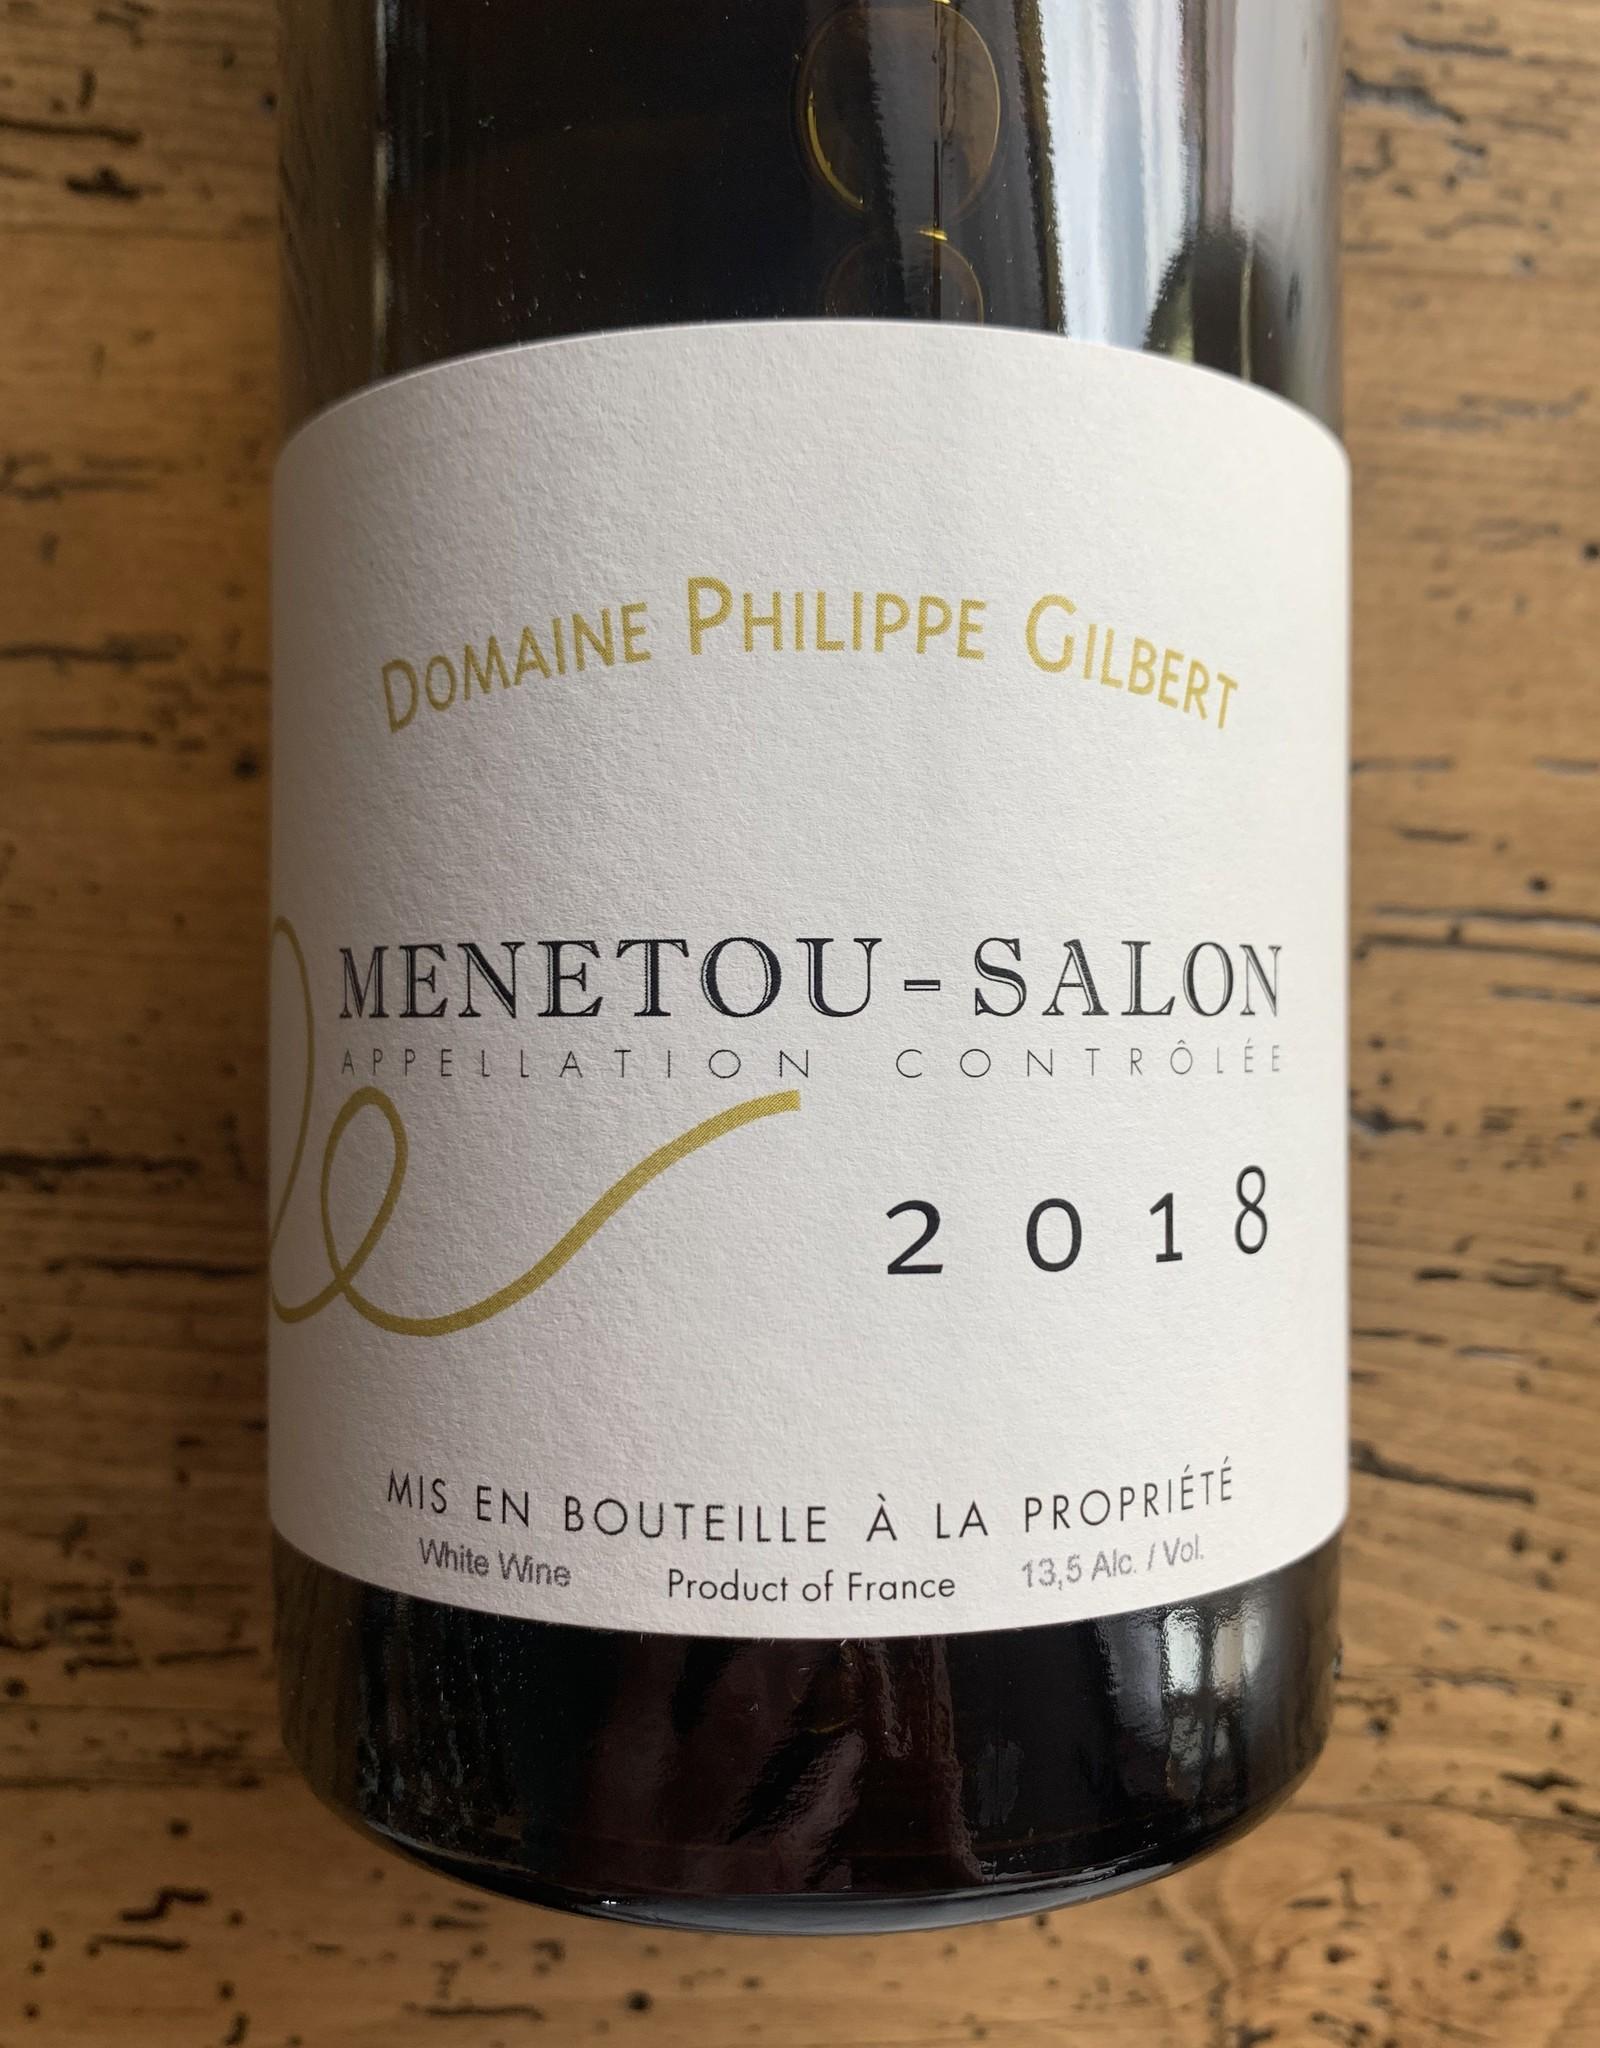 Domaine Philippe Gilbert Menetou-Salon